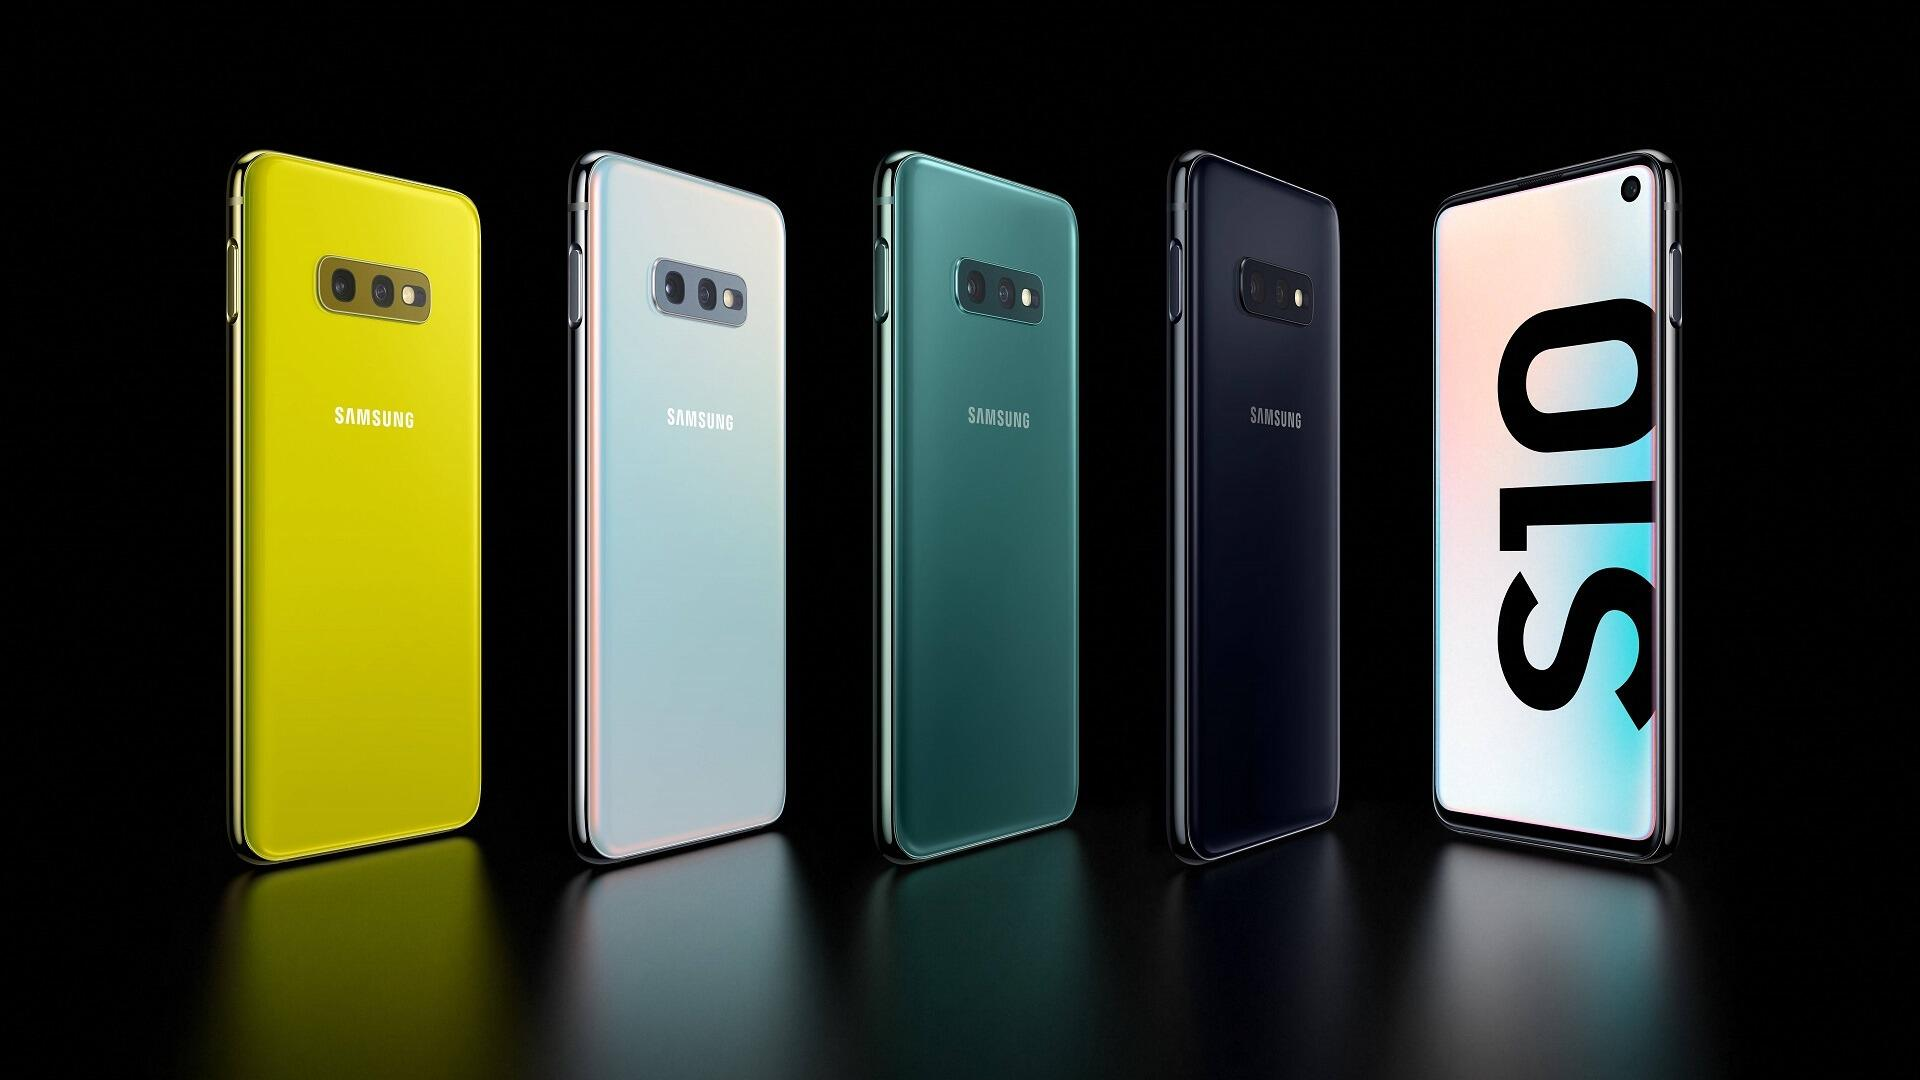 Smartphone Samsung Galaxy S10 128GB 4G Wi-Fi Tela 6.1'' Dual Chip 8MP RAM Câmera Tripla + Selfie 10MP